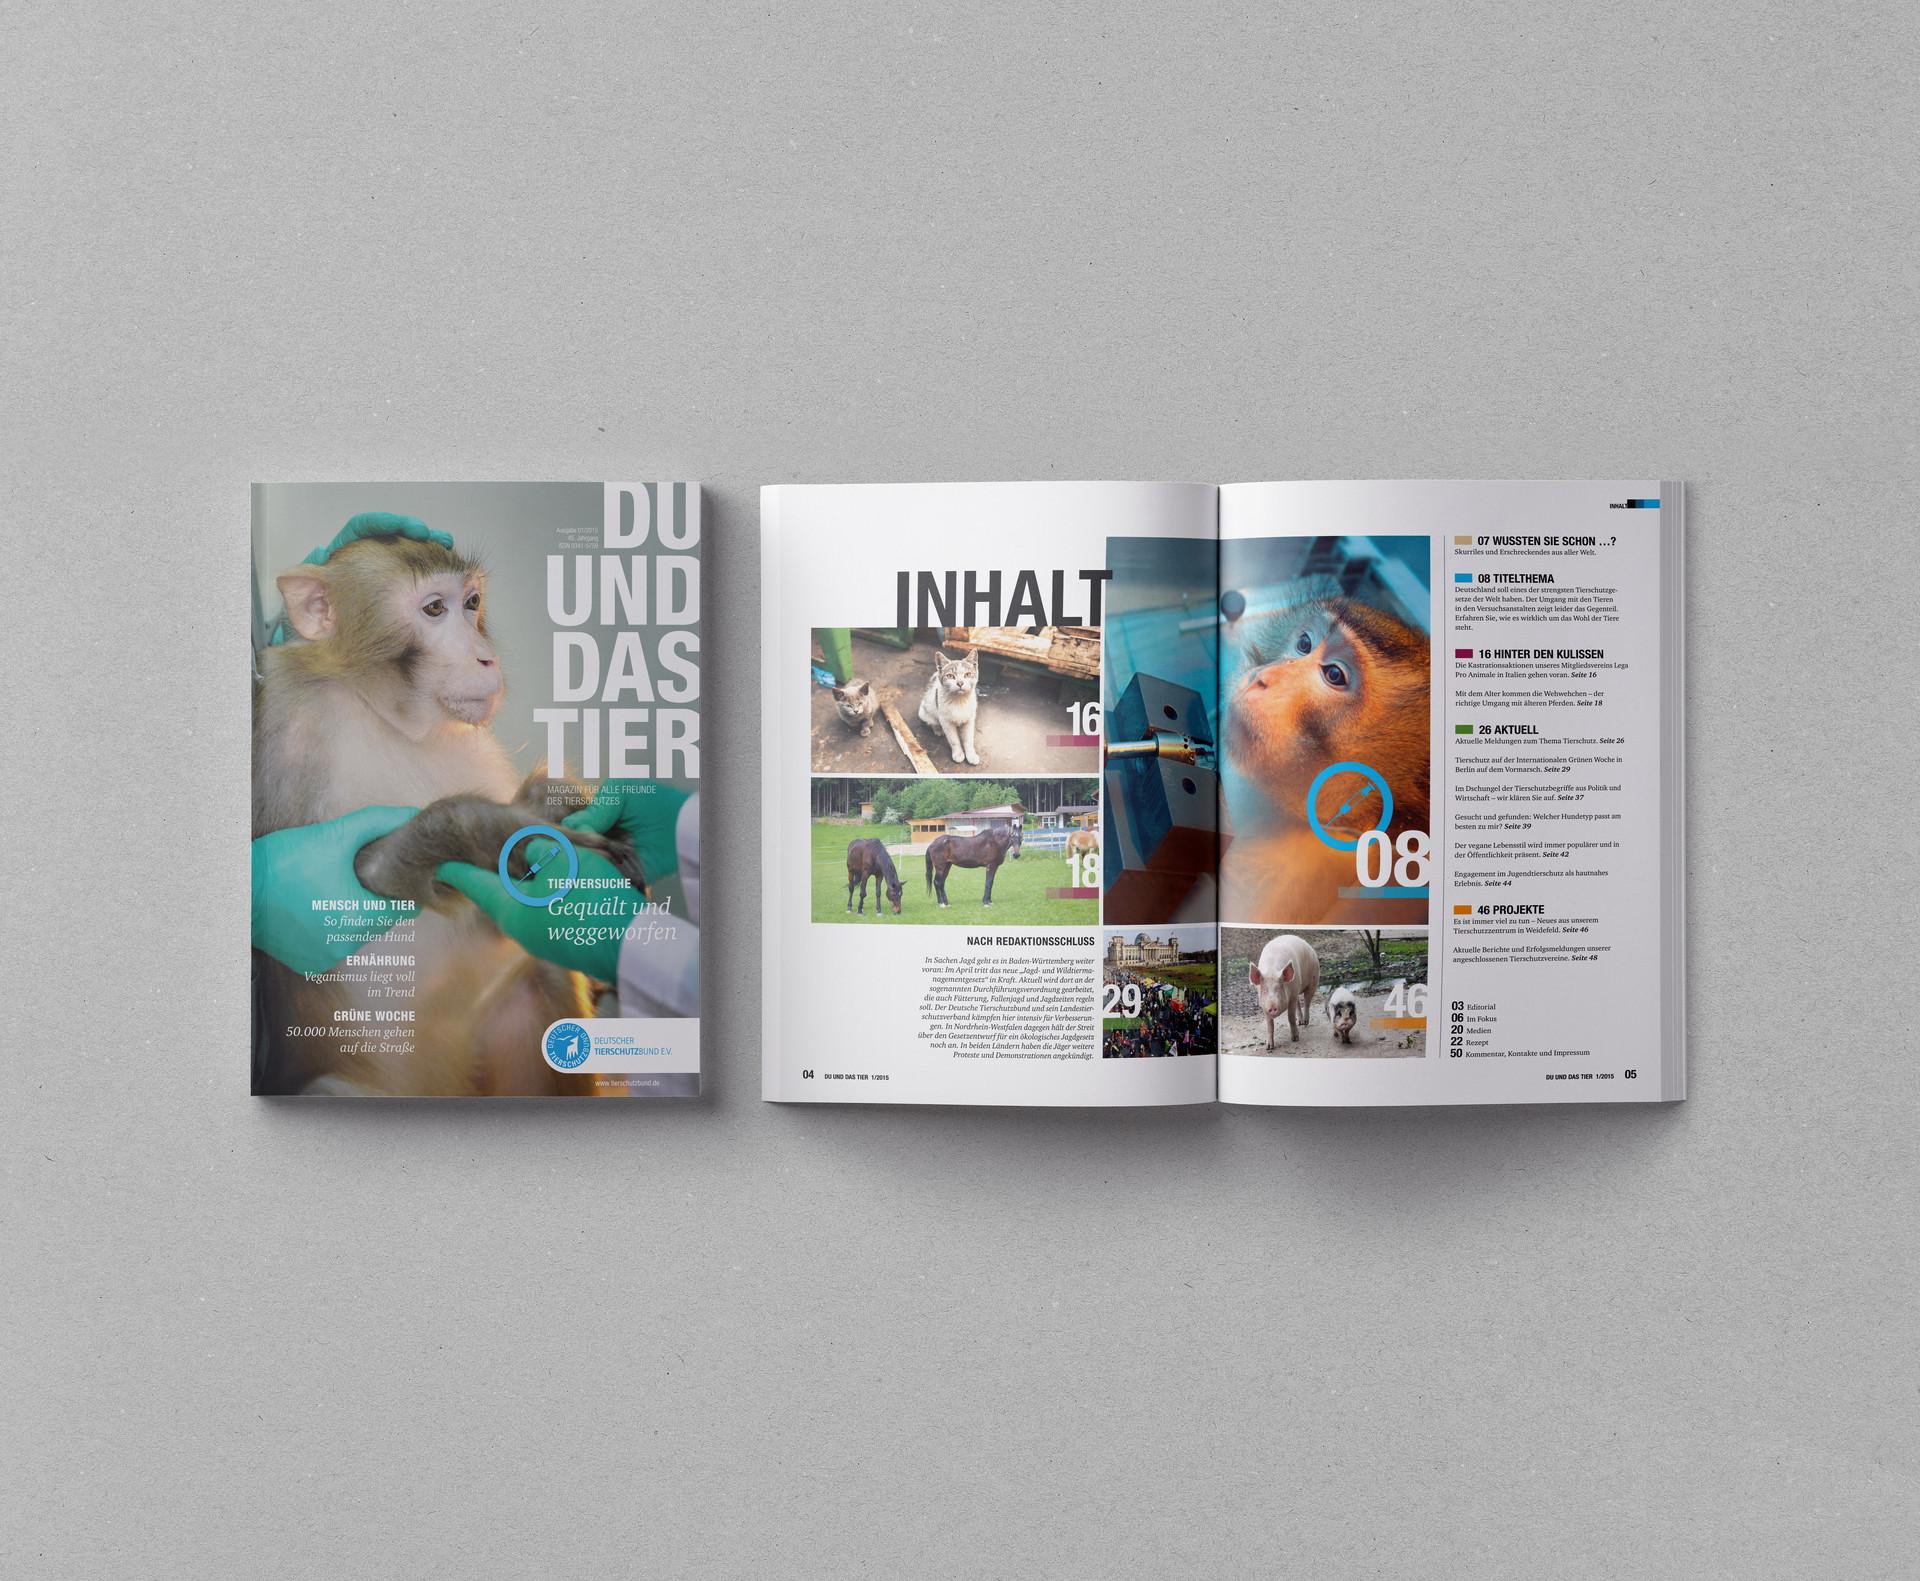 Magazine-USLetter-A4-Mockup-Template_DUD